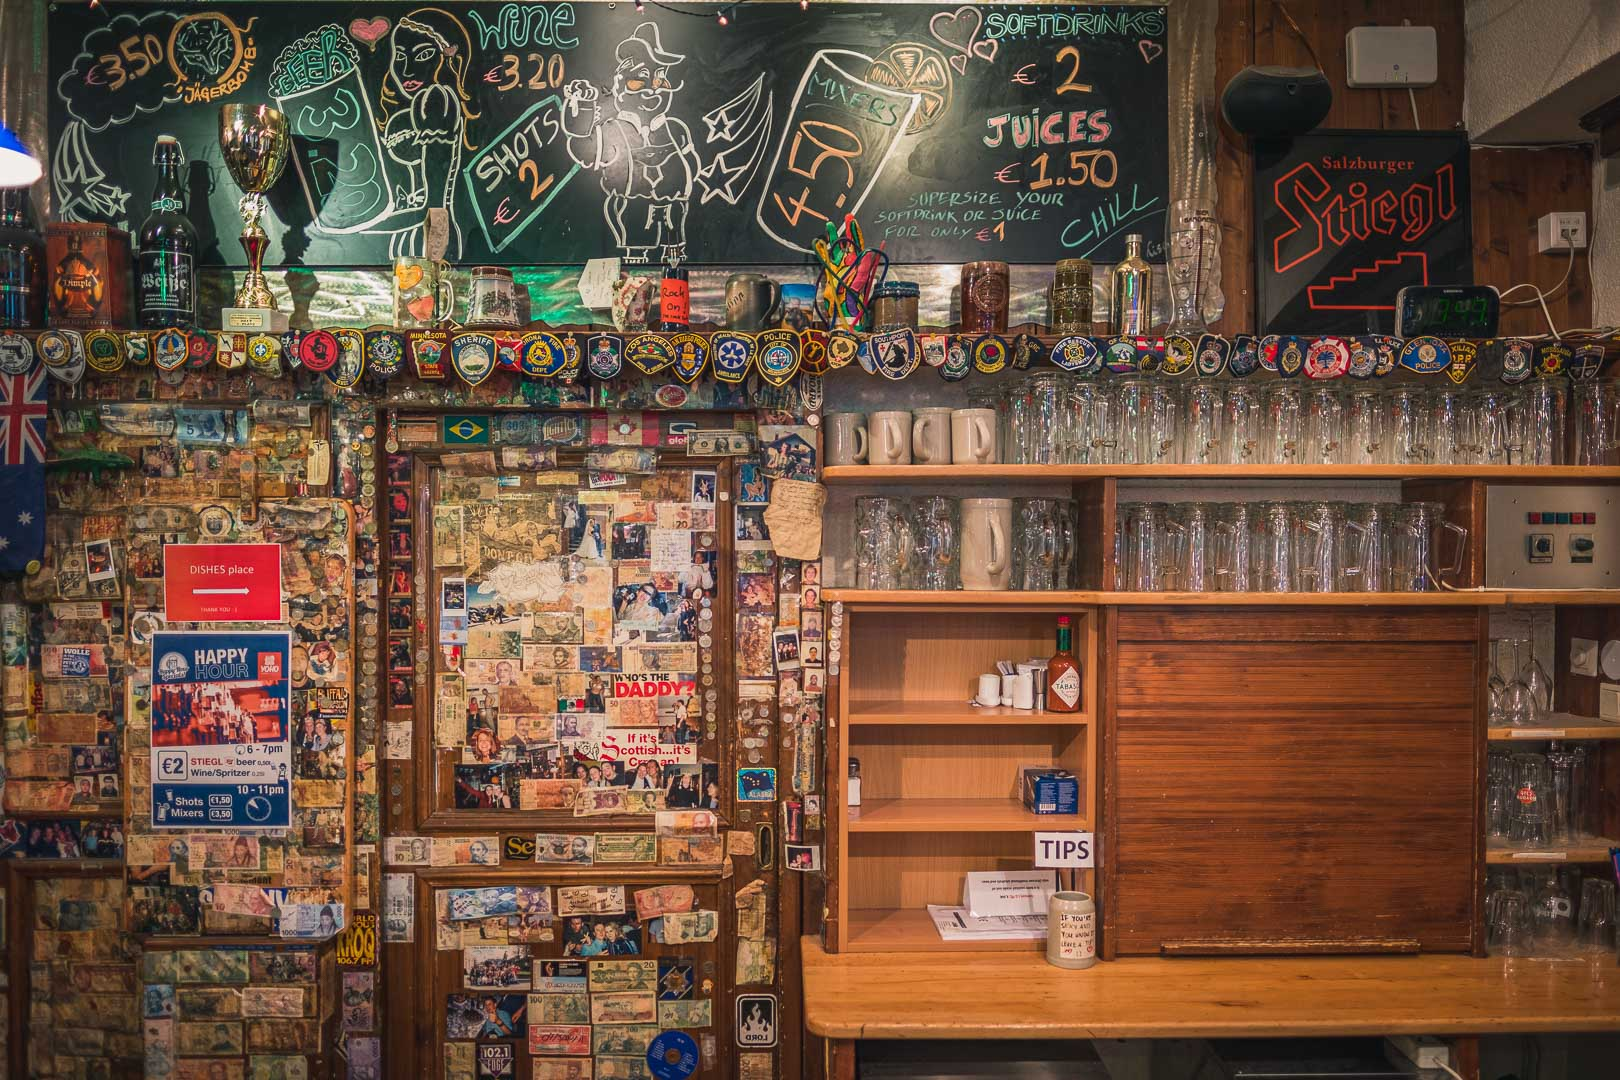 The Yoho Hostel bar when its closed